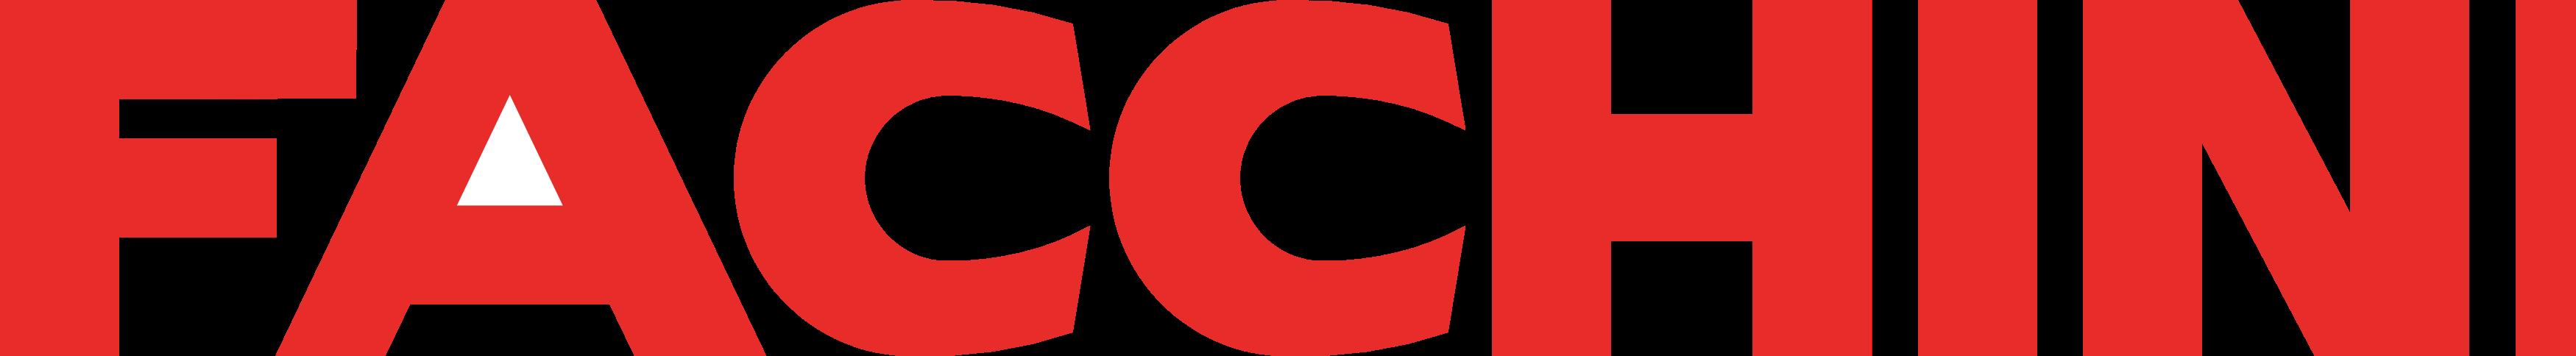 Facchini logo.